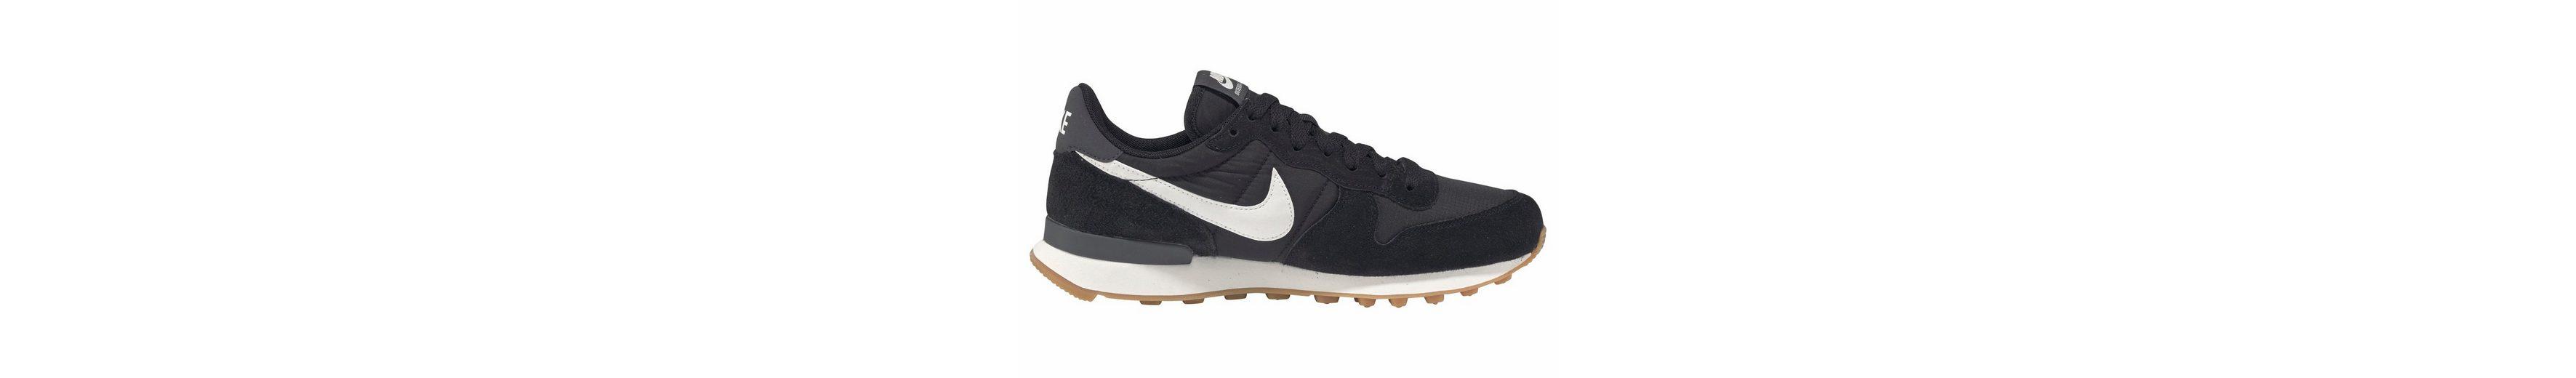 Nike Sportswear Wmns Internationalist Sneaker Besuchen Neu Zu Verkaufen Kb2A0mE